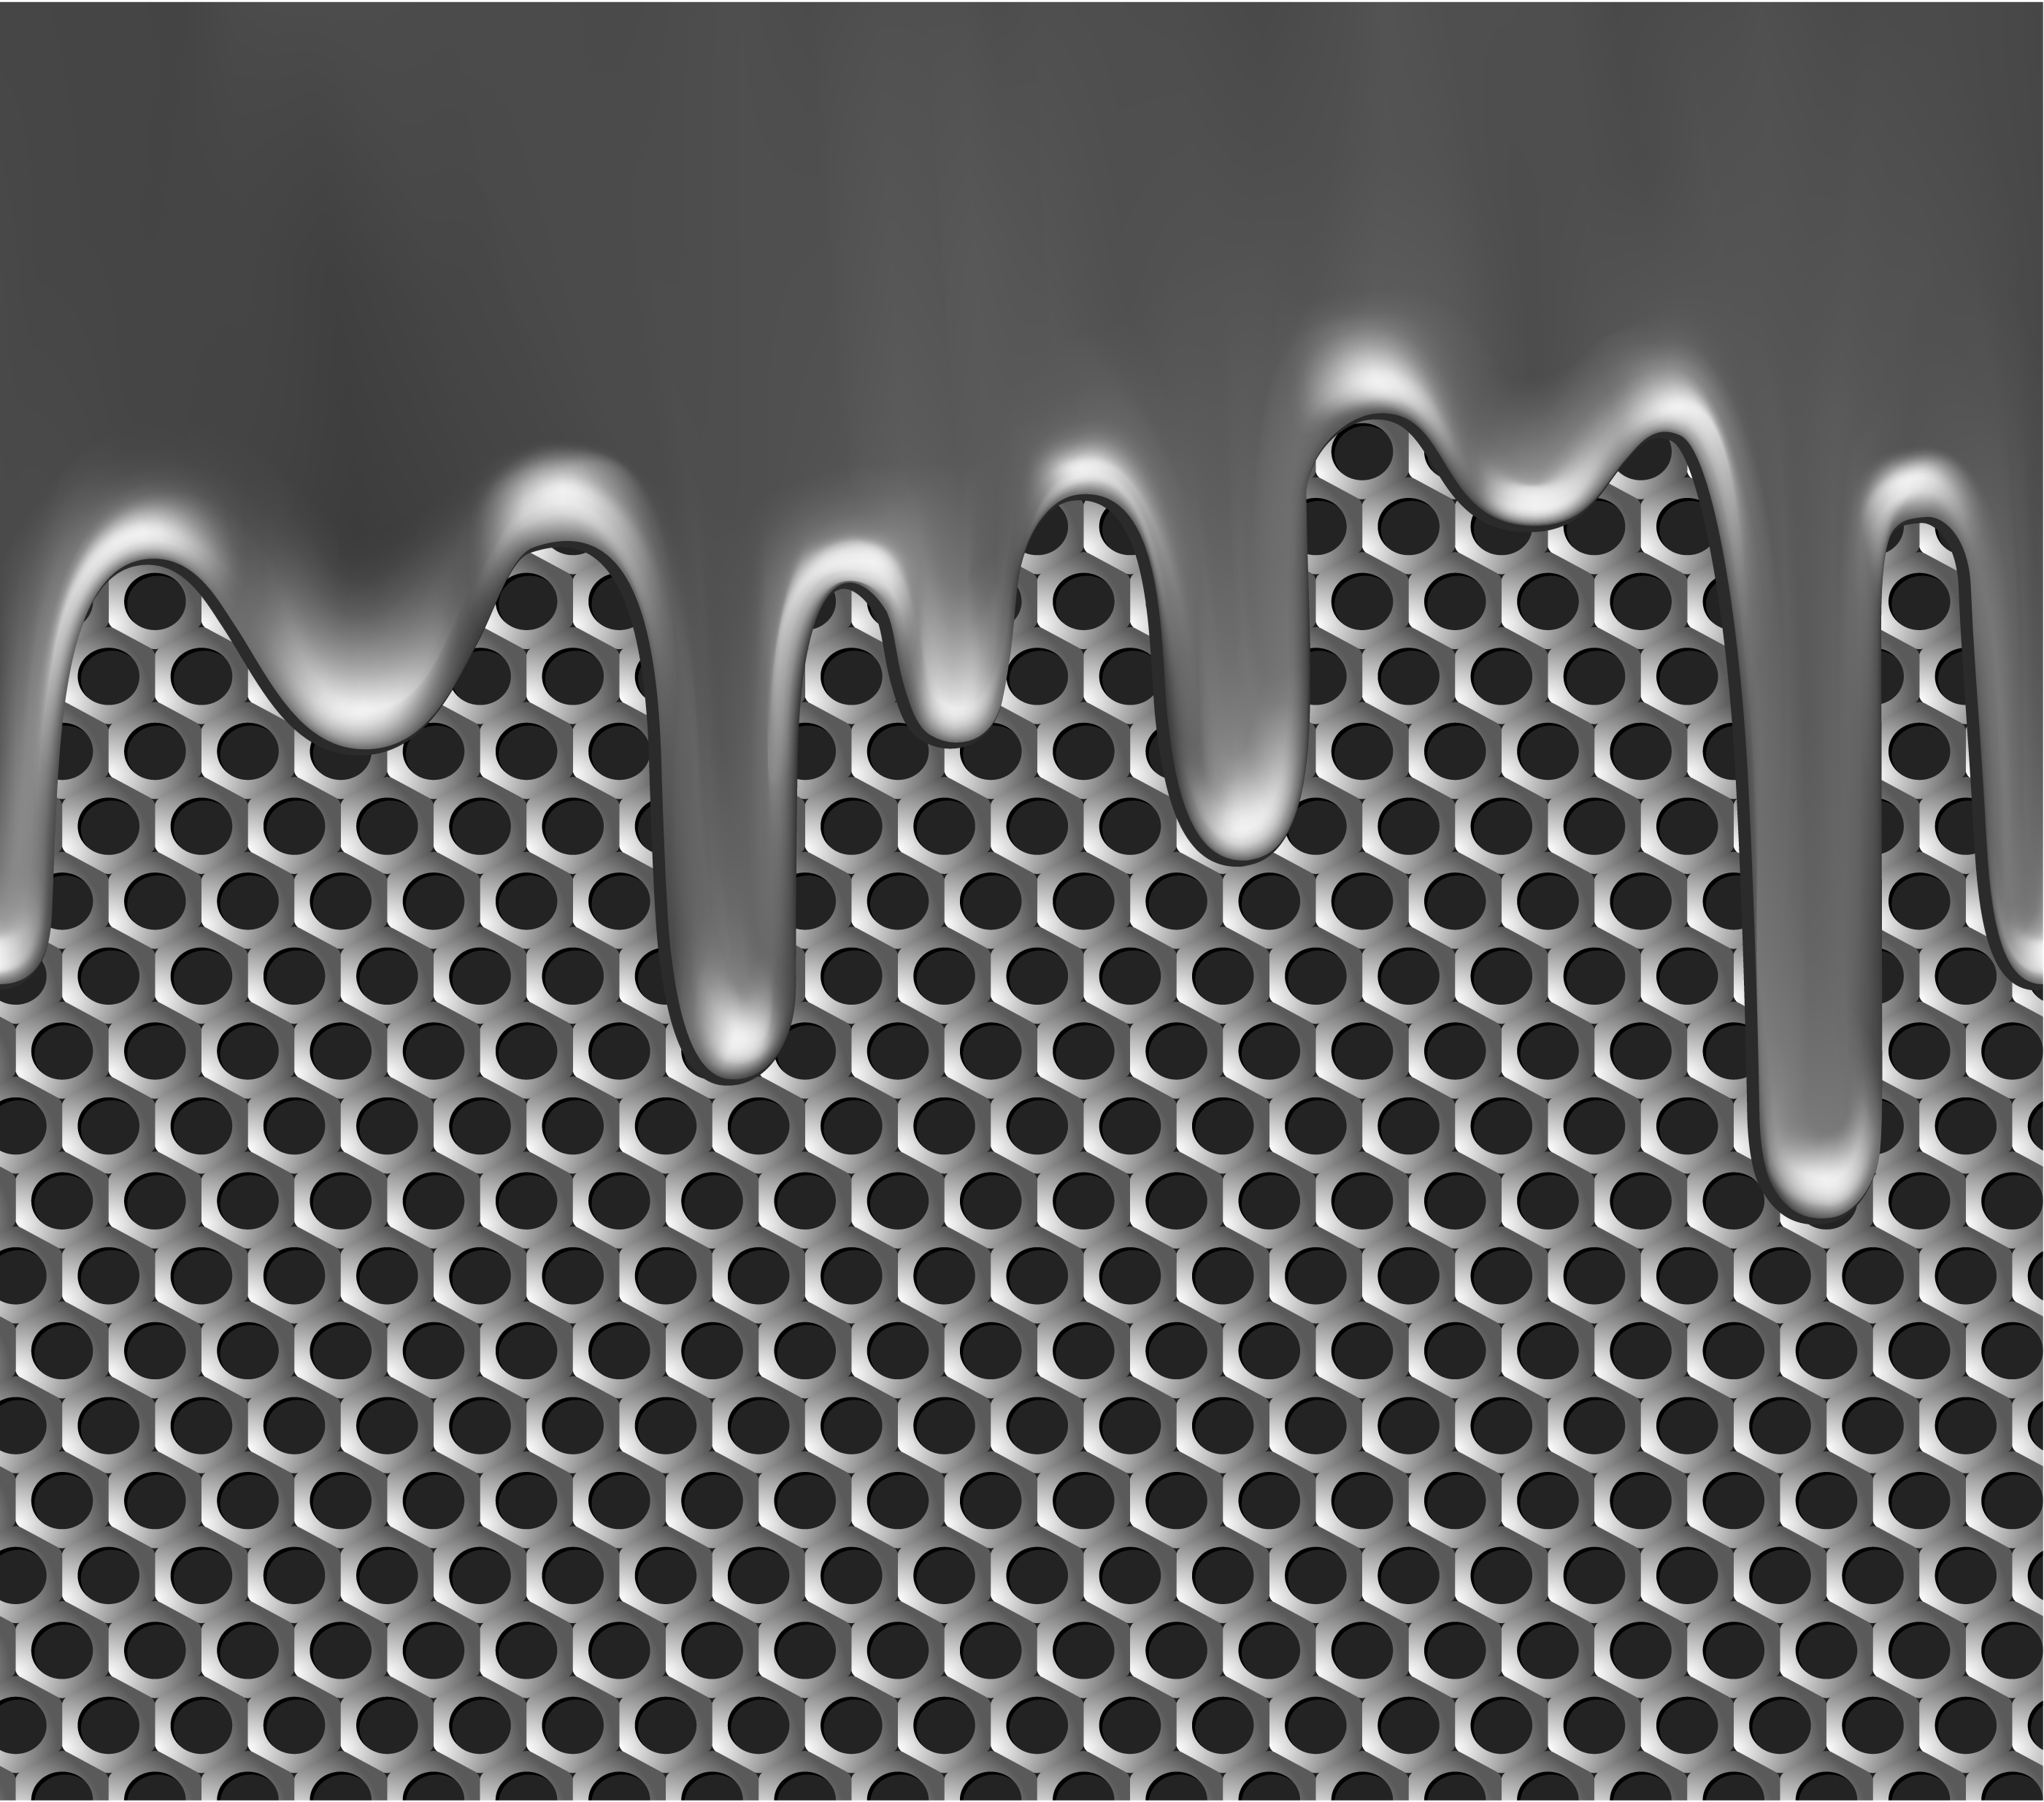 Metal 3D printing takes flight | TechCrunch